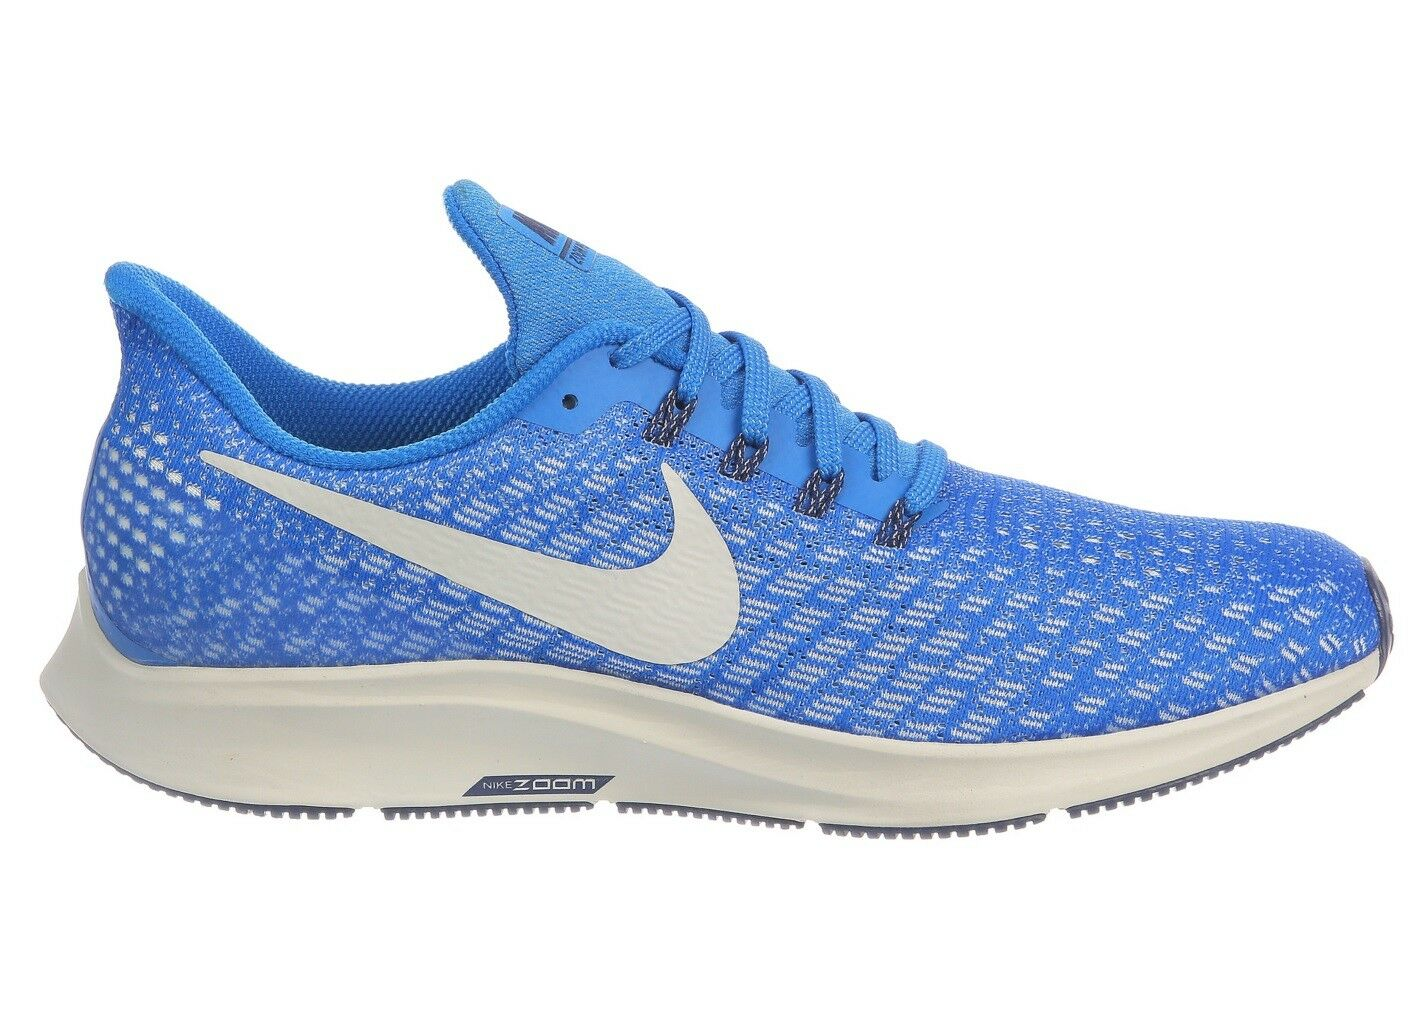 0fcc0fa7e592 Nike Air Zoom Pegasus 35 35 35 Mens 942851-402 Cobalt Blaze Running Shoes  Size 12.5 3fb586